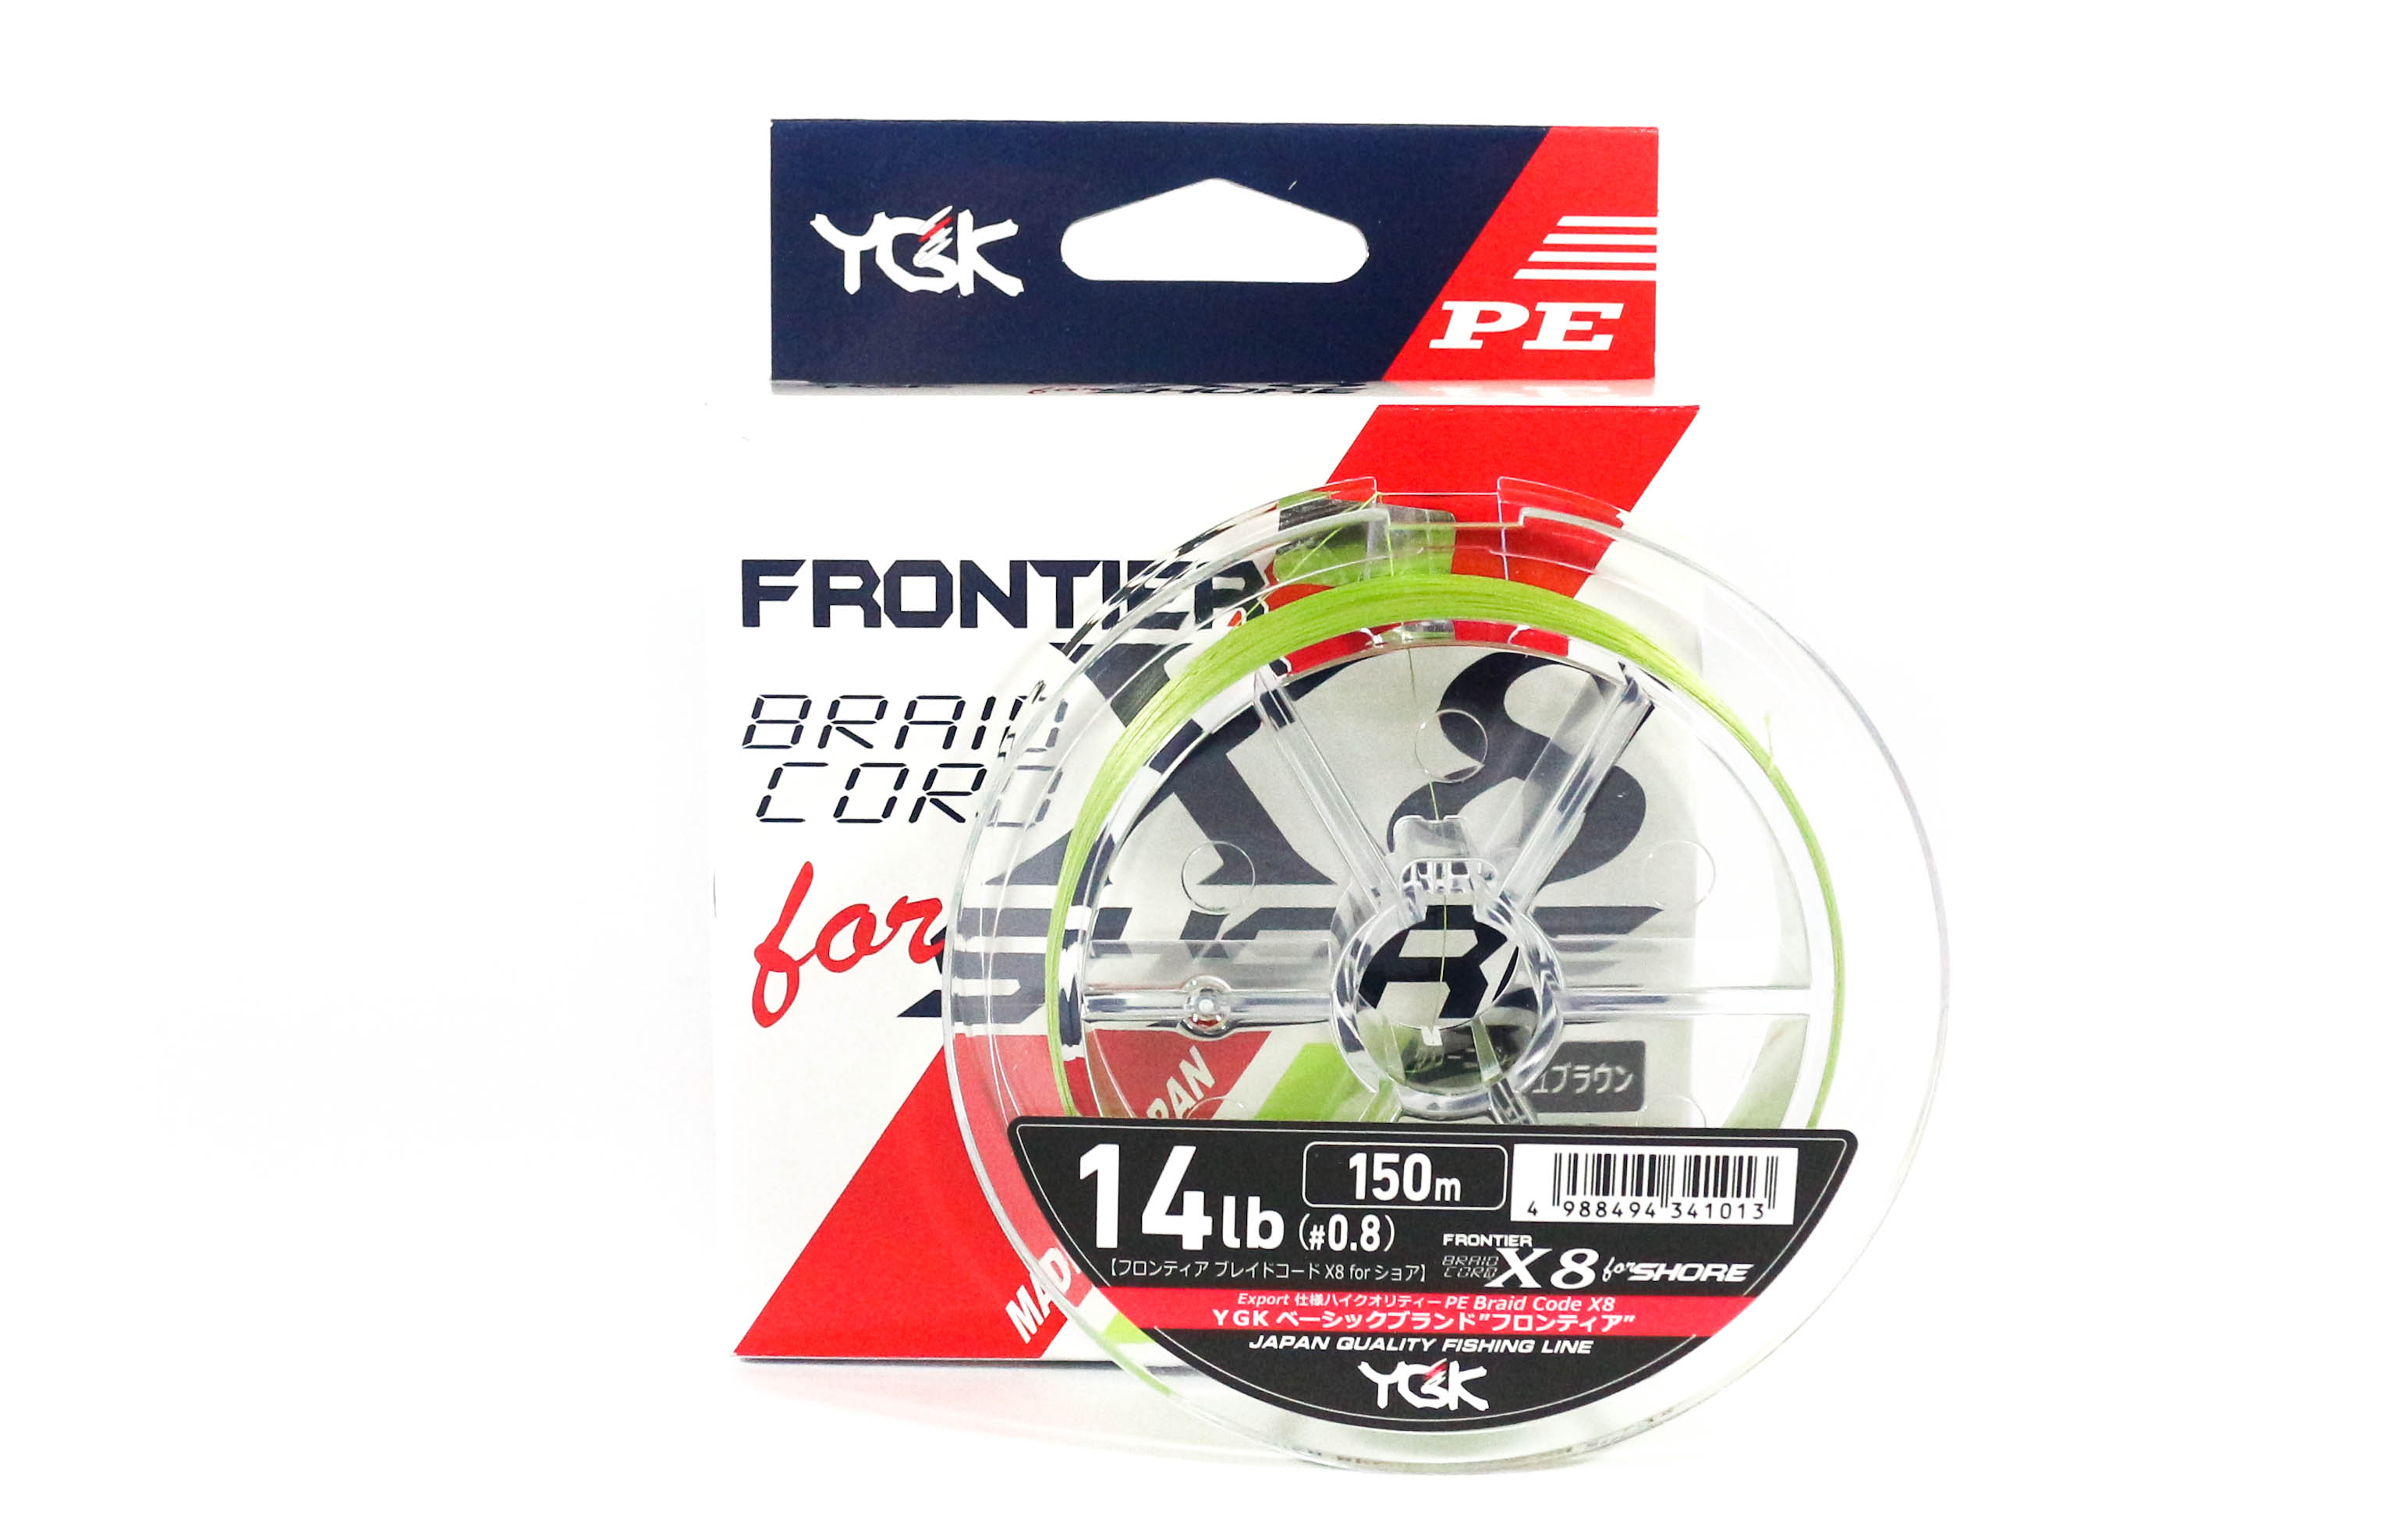 YGK LONFORT REALDTEX WX8 150m 12lb #0.4